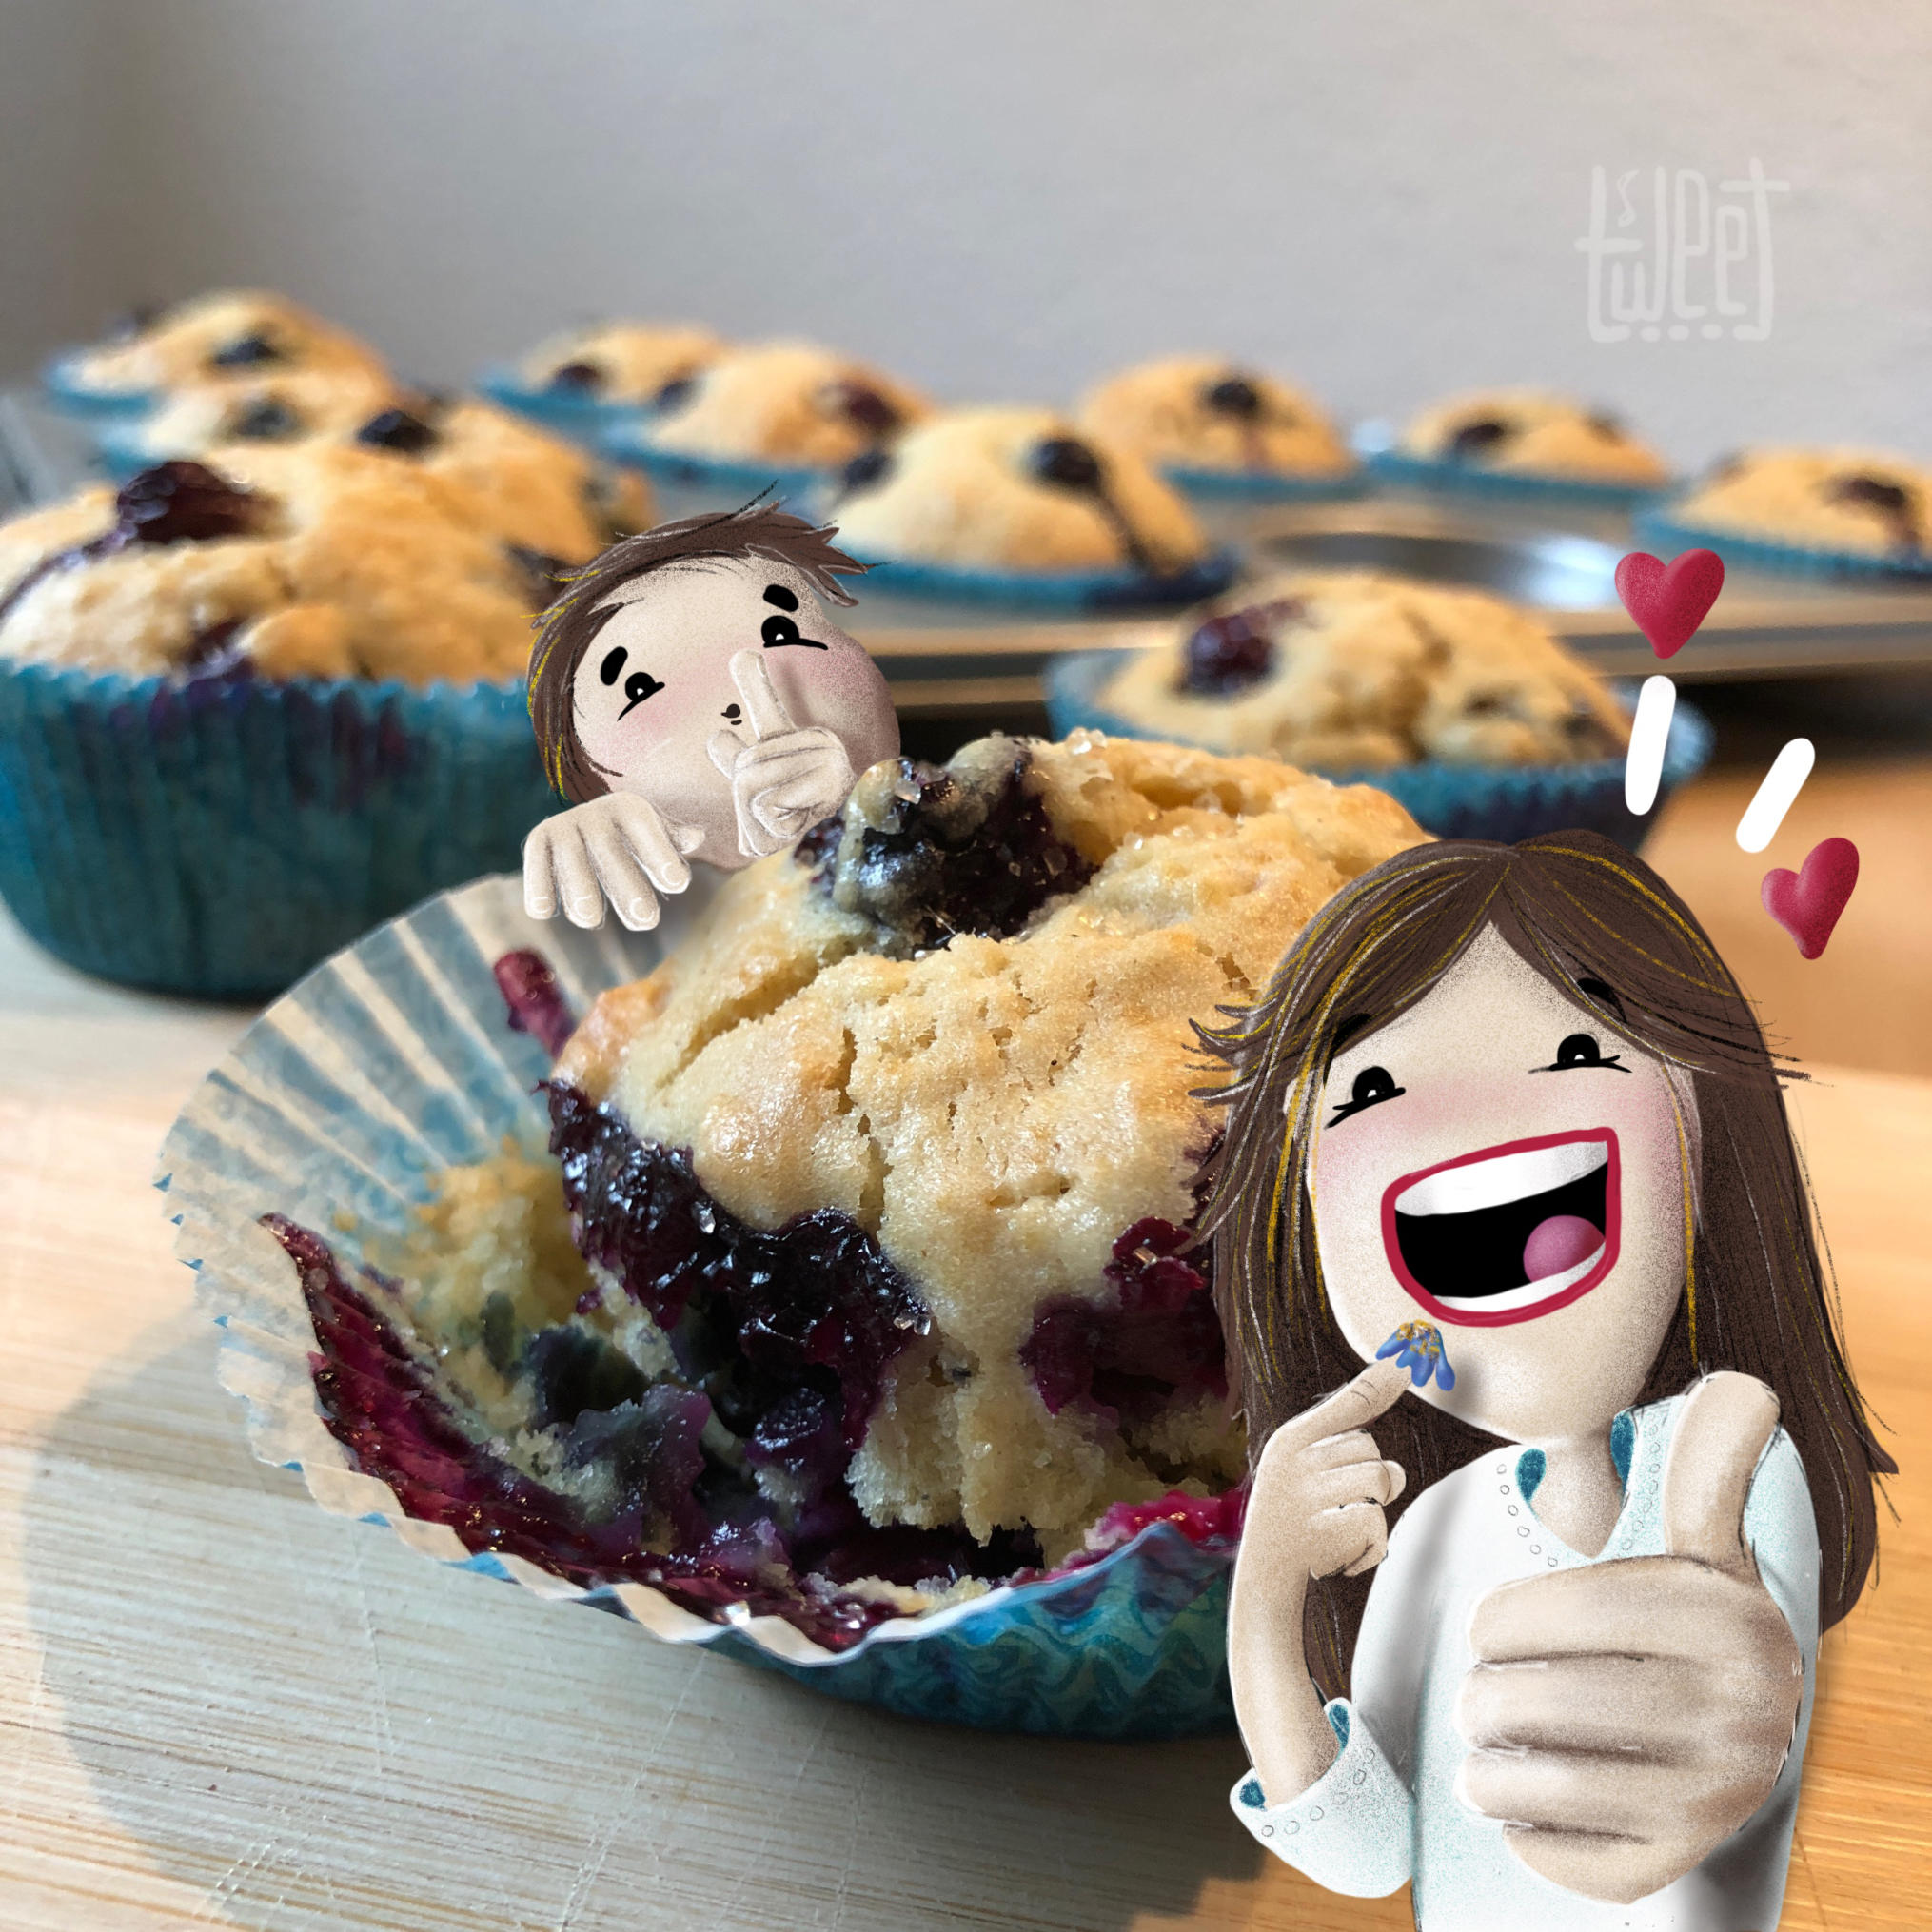 Photo Bombing - Baking Blueberry Muffins